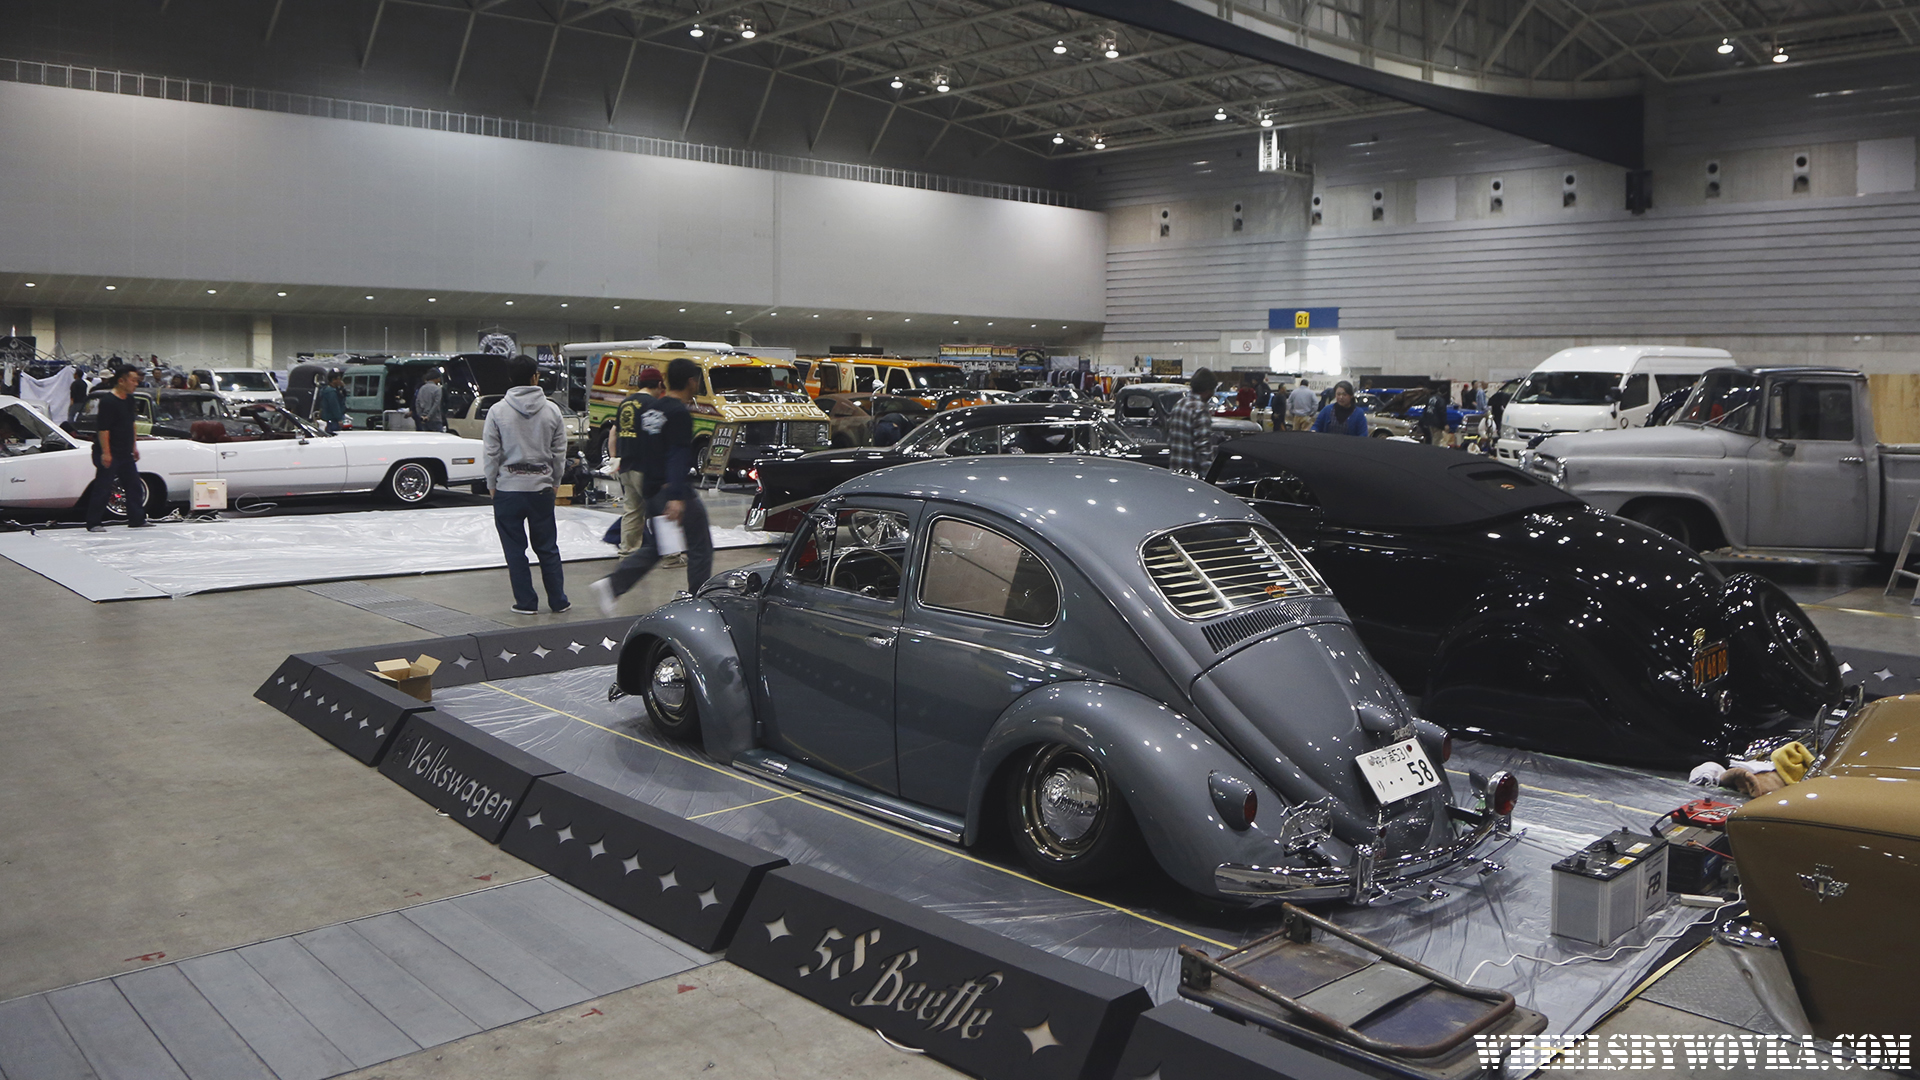 mooneyes-yokohama-hot-rod-custom-show-cars-2017-3